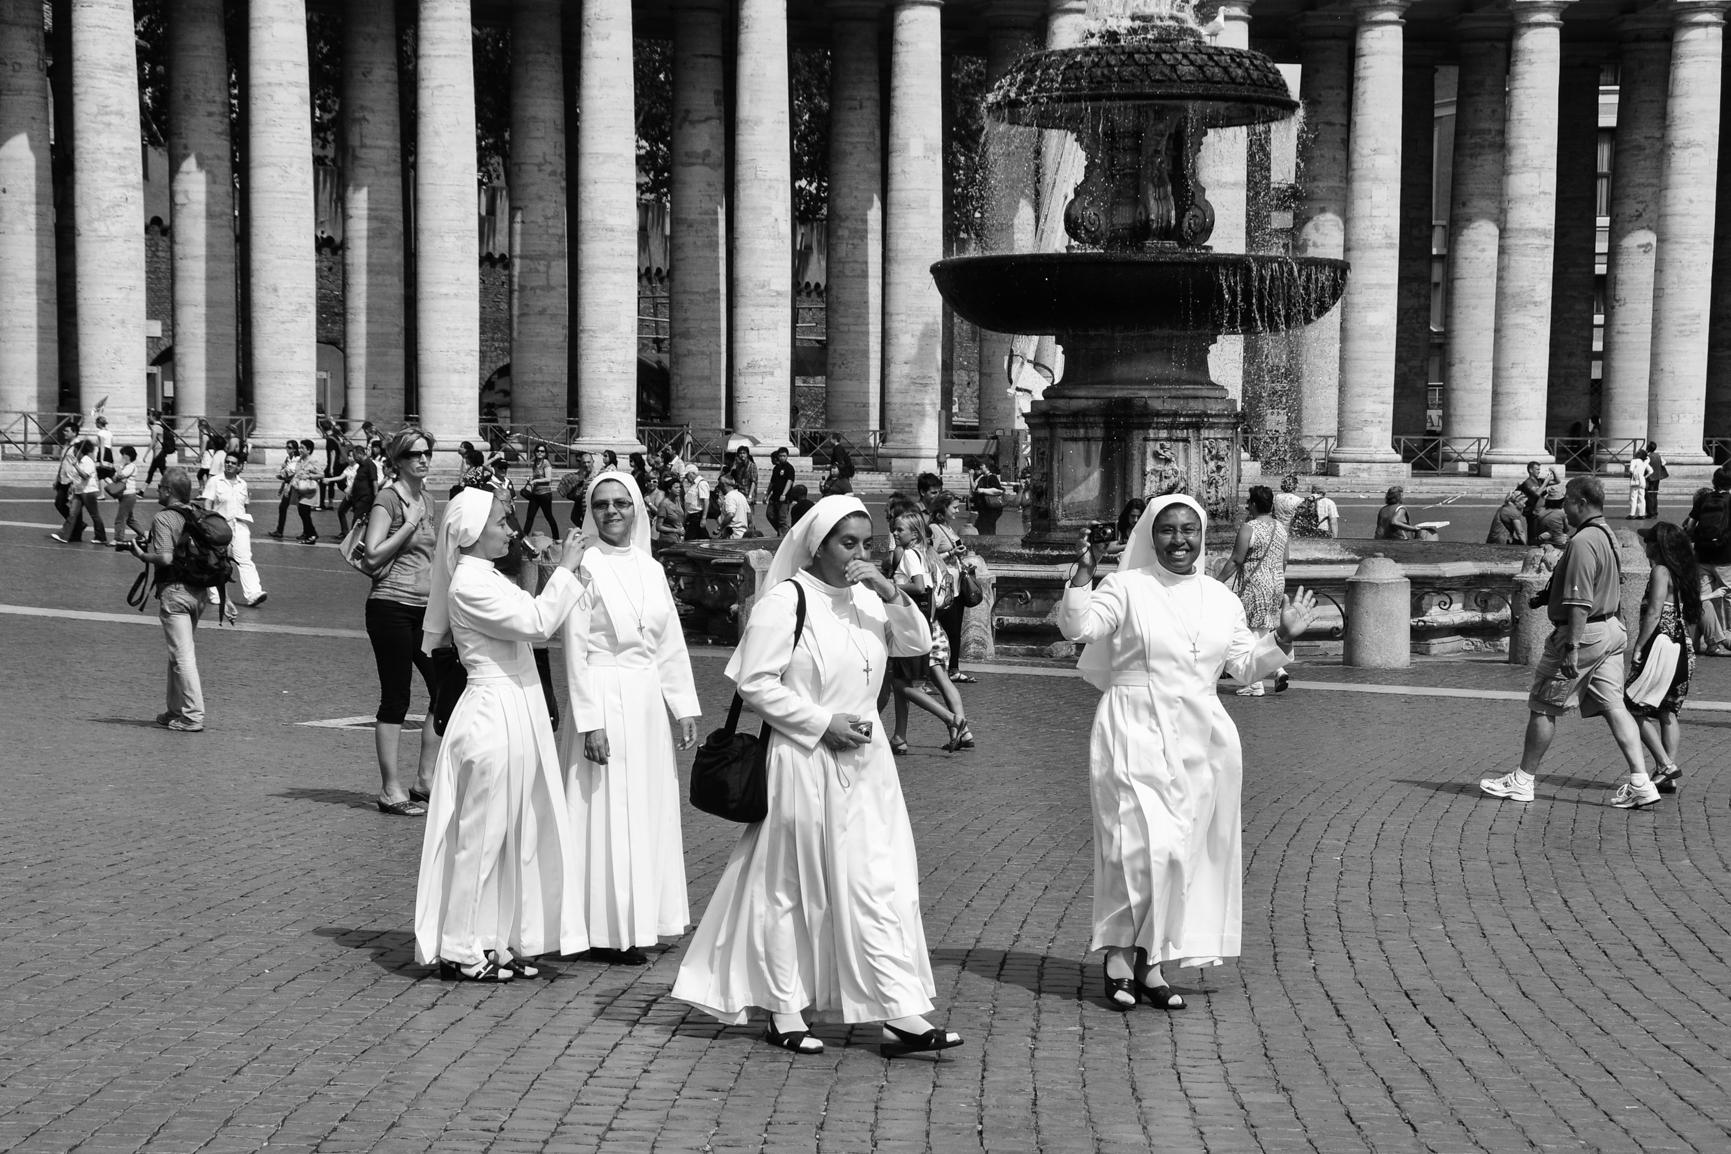 Piazza San Pietro. Vatican